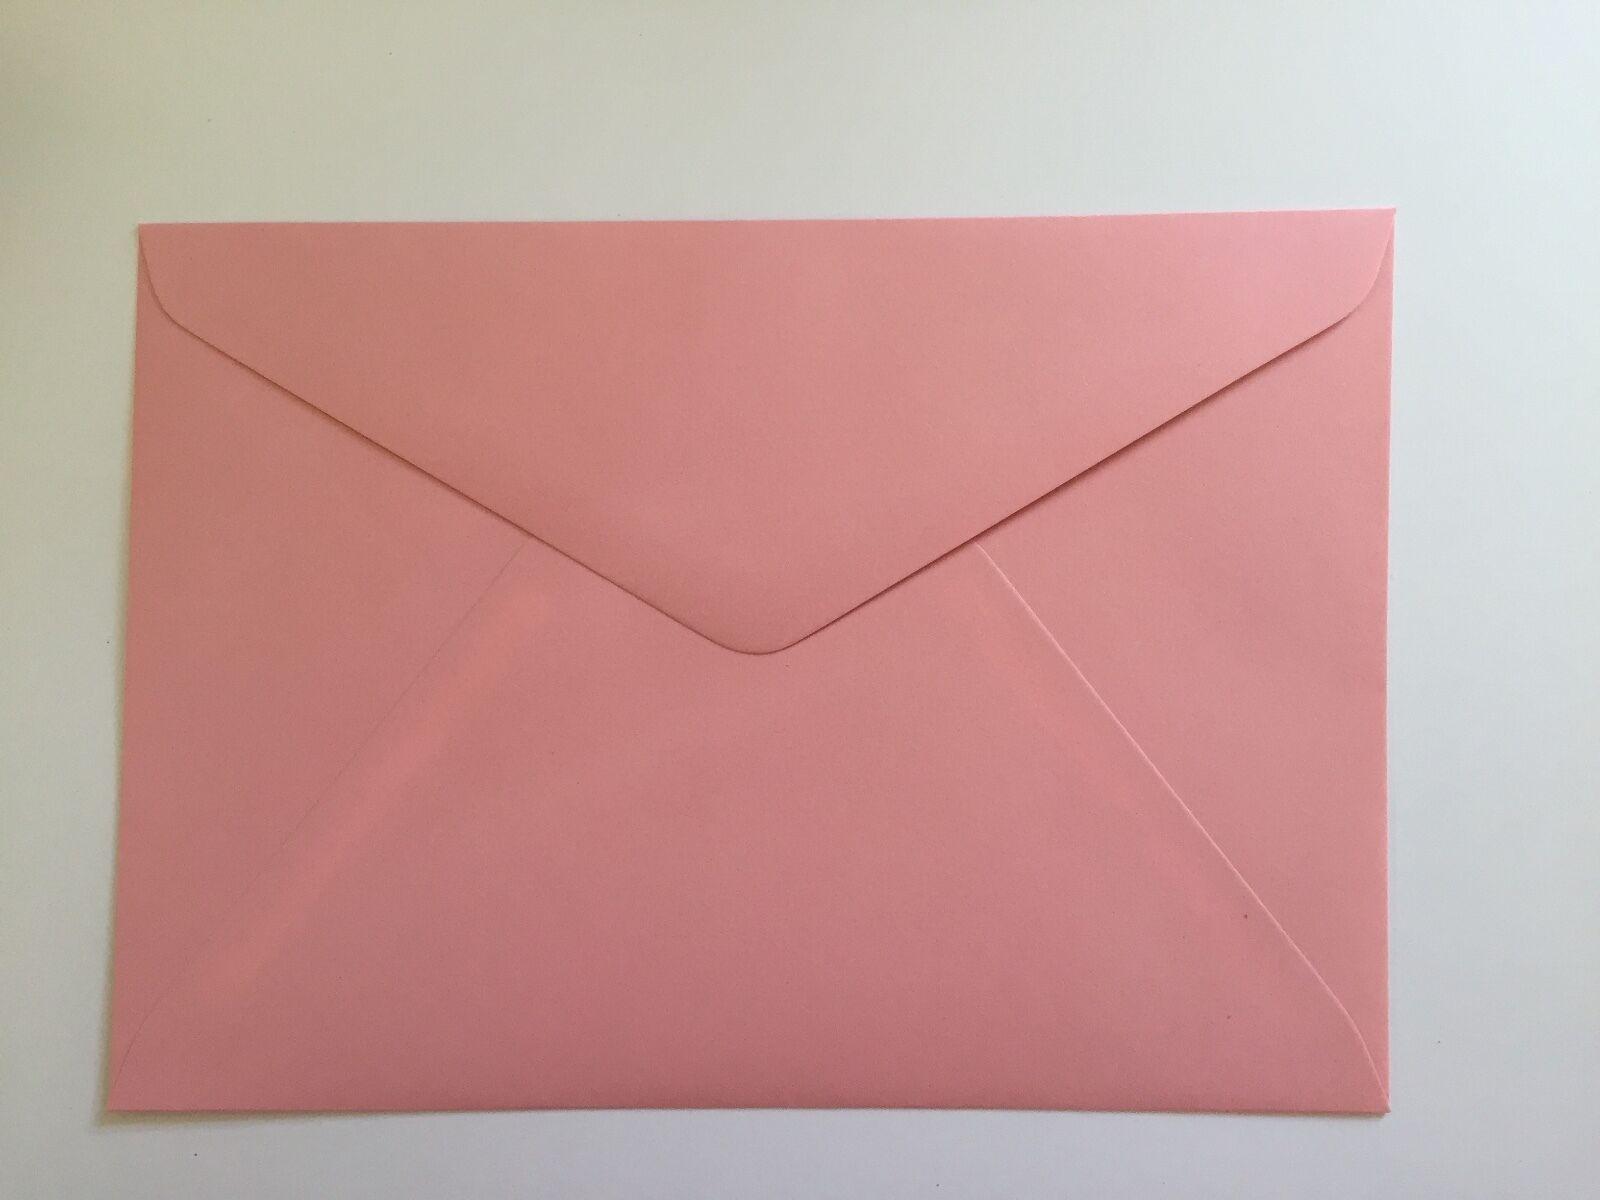 50 C5 Blue Curious Collection Translucent Envelopes Vellum Peel /& Seal